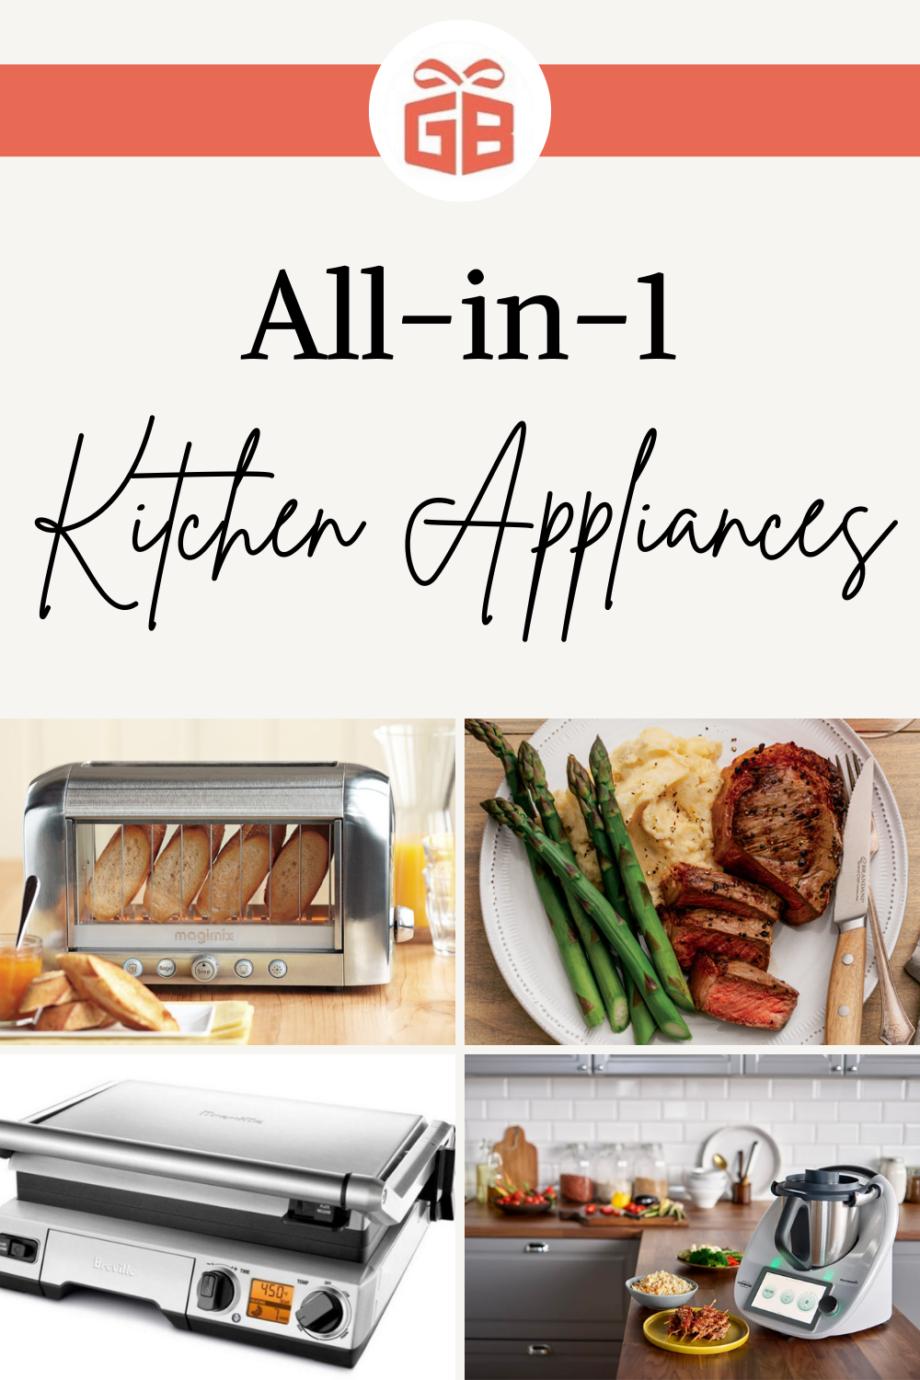 Kitchen Catch: Four Terrific All-in-1 Appliances